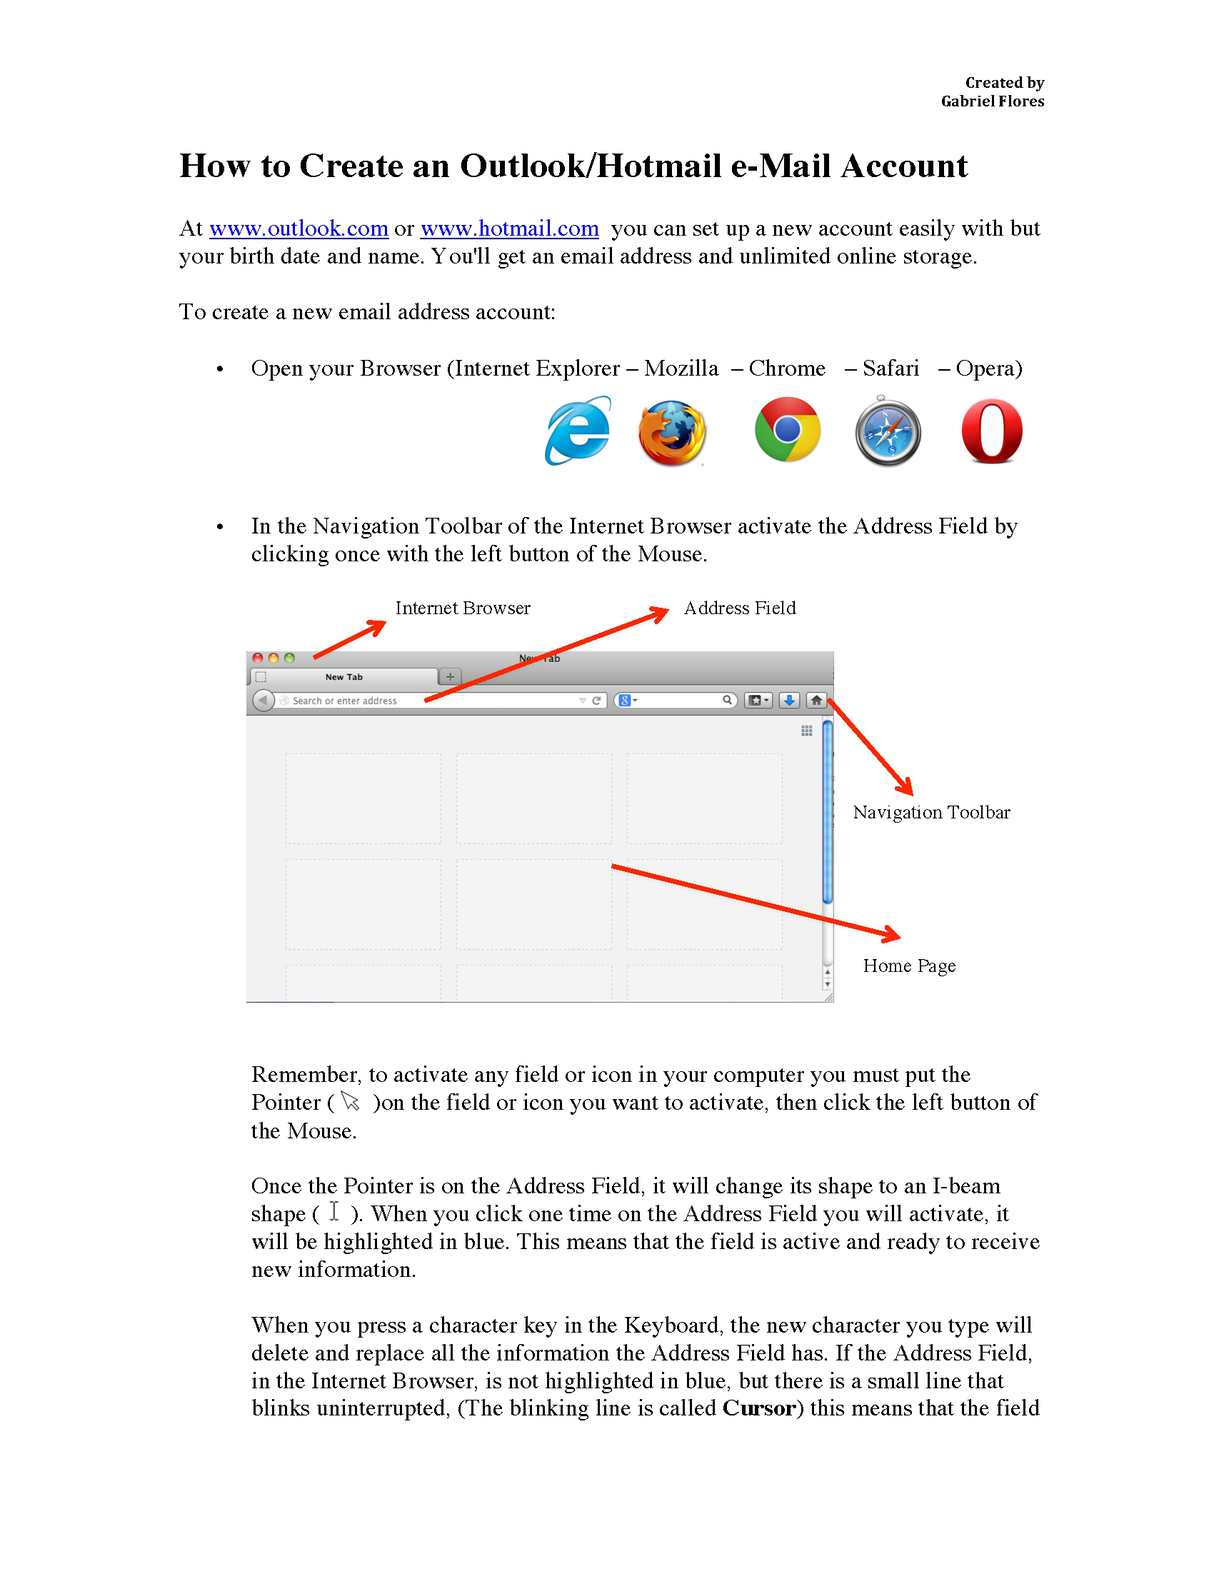 Calaméo - Create an Outlook/Hotmail e-Mail Account Step by Step